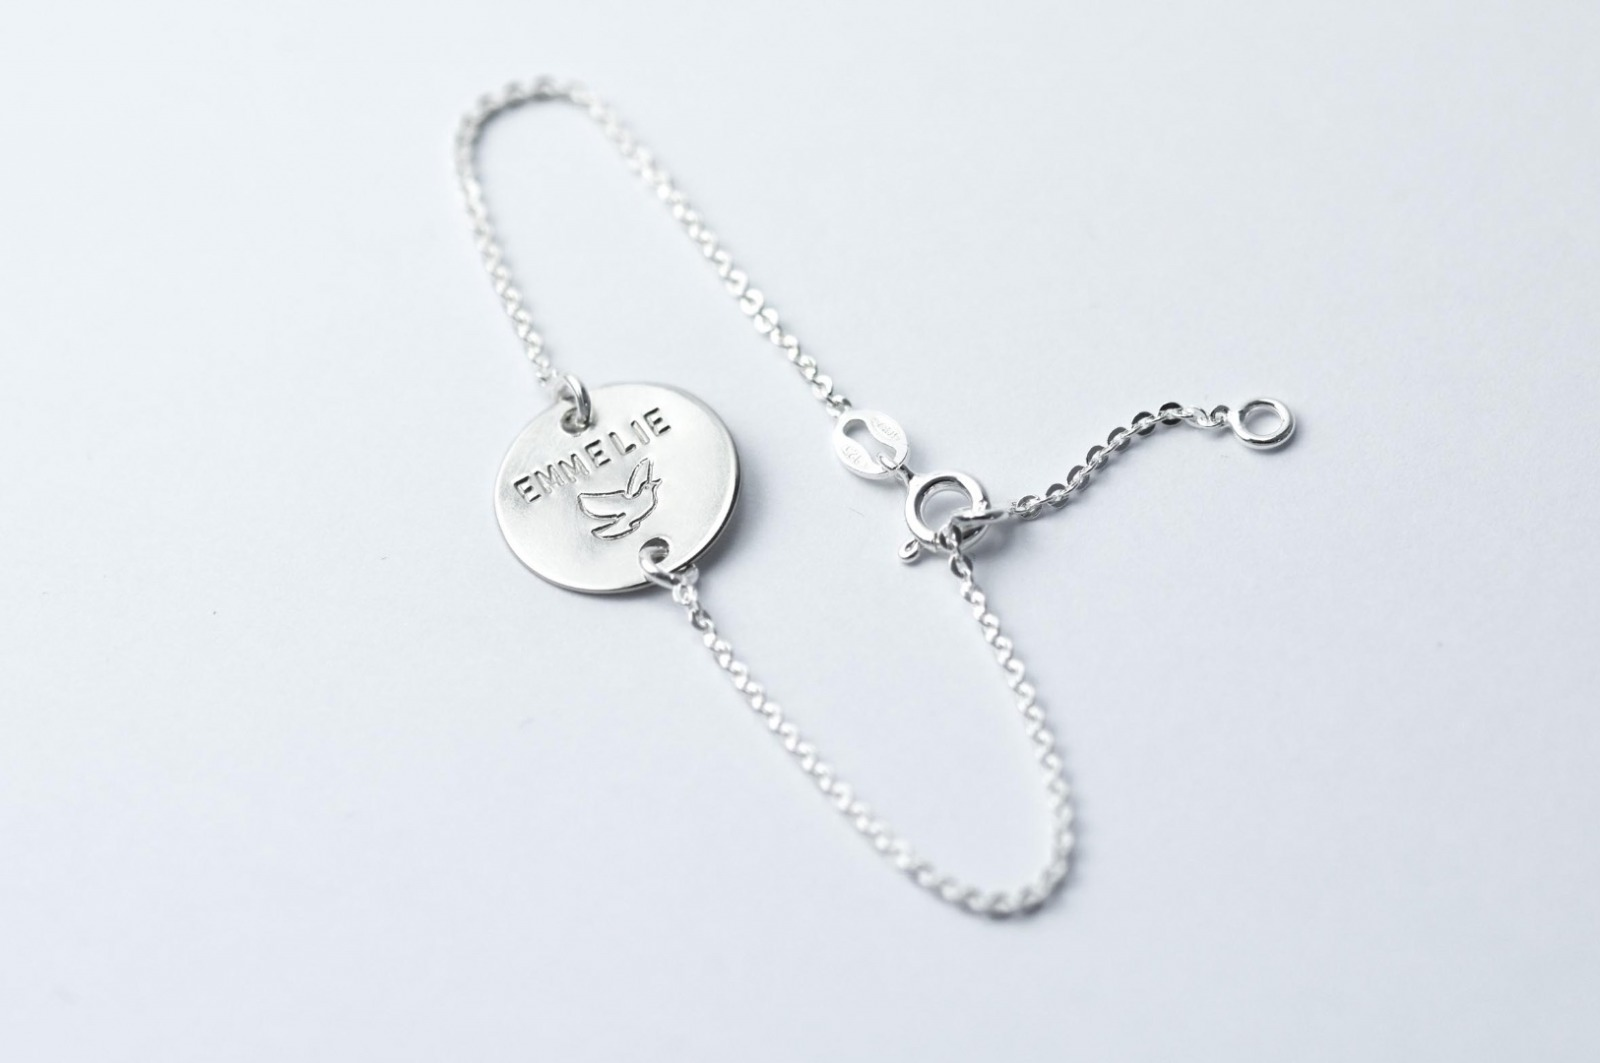 Zartes Silberarmband 1 - Namens-, Geburts-, Spruchband